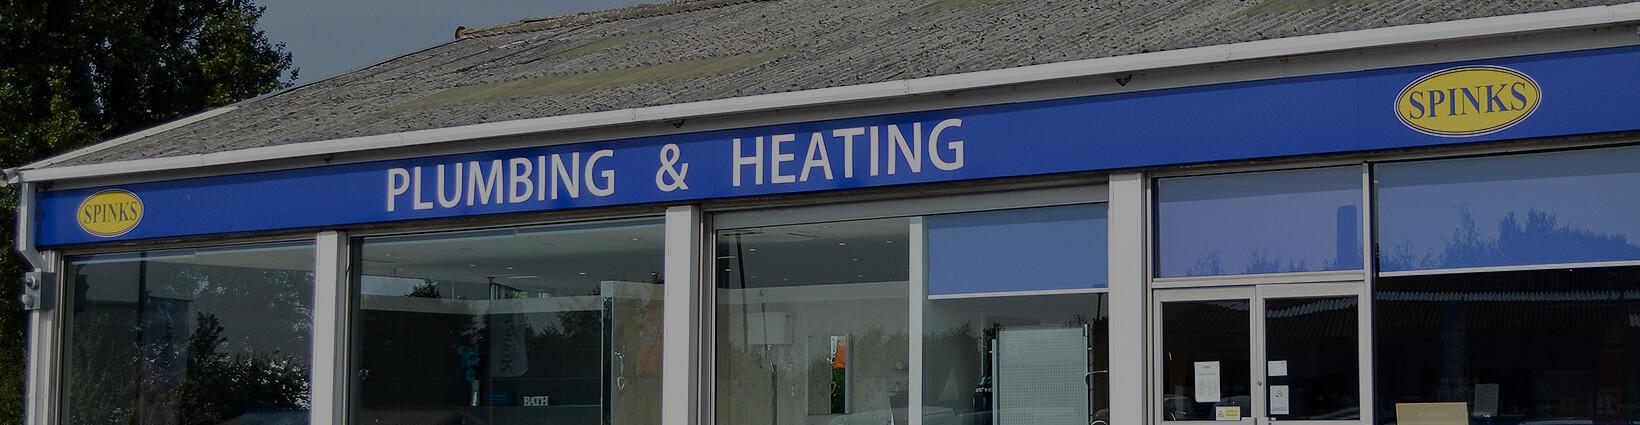 worksop spinks plumbing heating